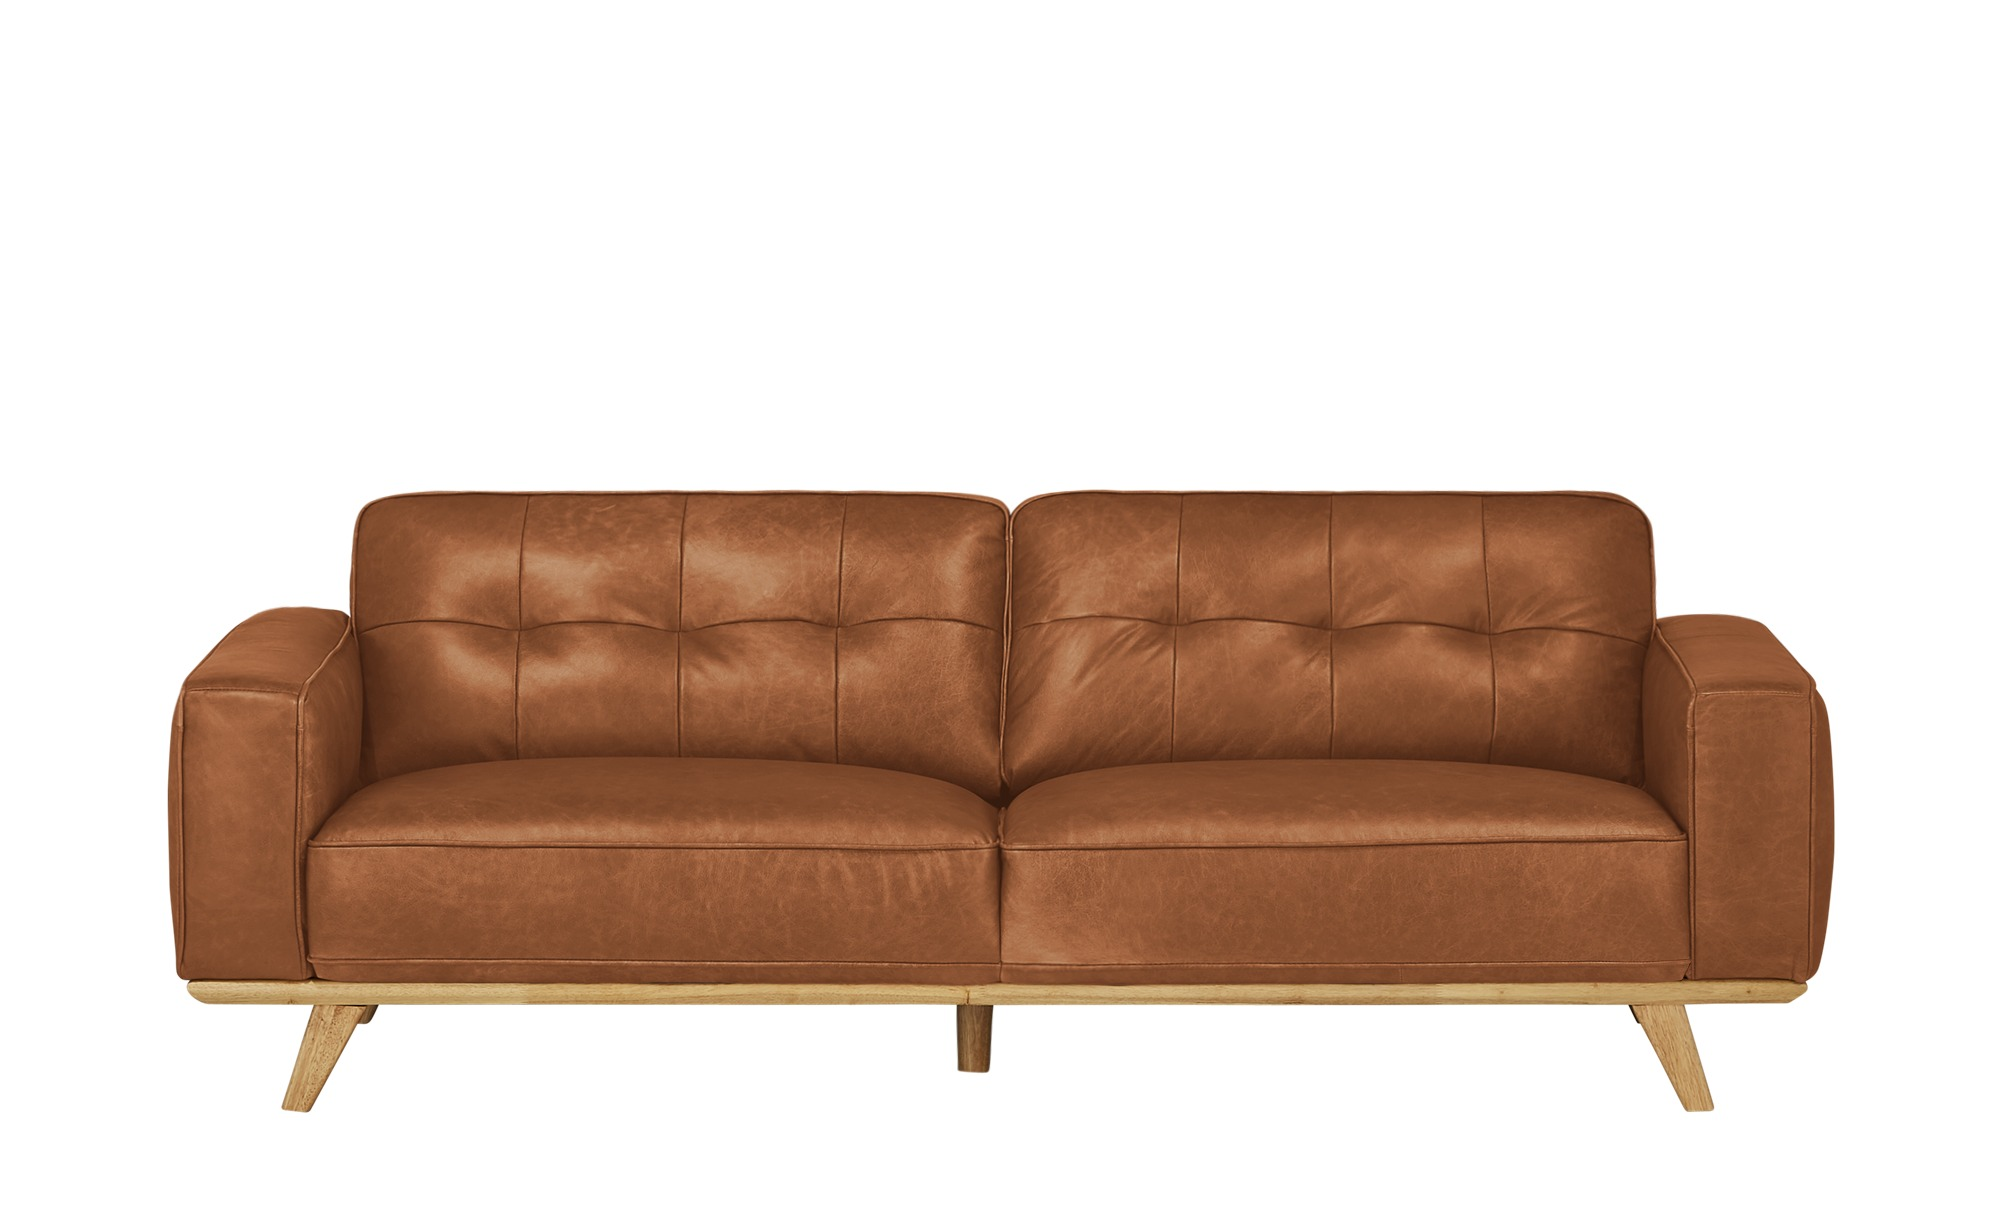 uno Ledersofa  Caralina ¦ orange ¦ Maße (cm): B: 227 H: 78 T: 95 Polstermöbel > Sofas > 3-Sitzer - Höffner